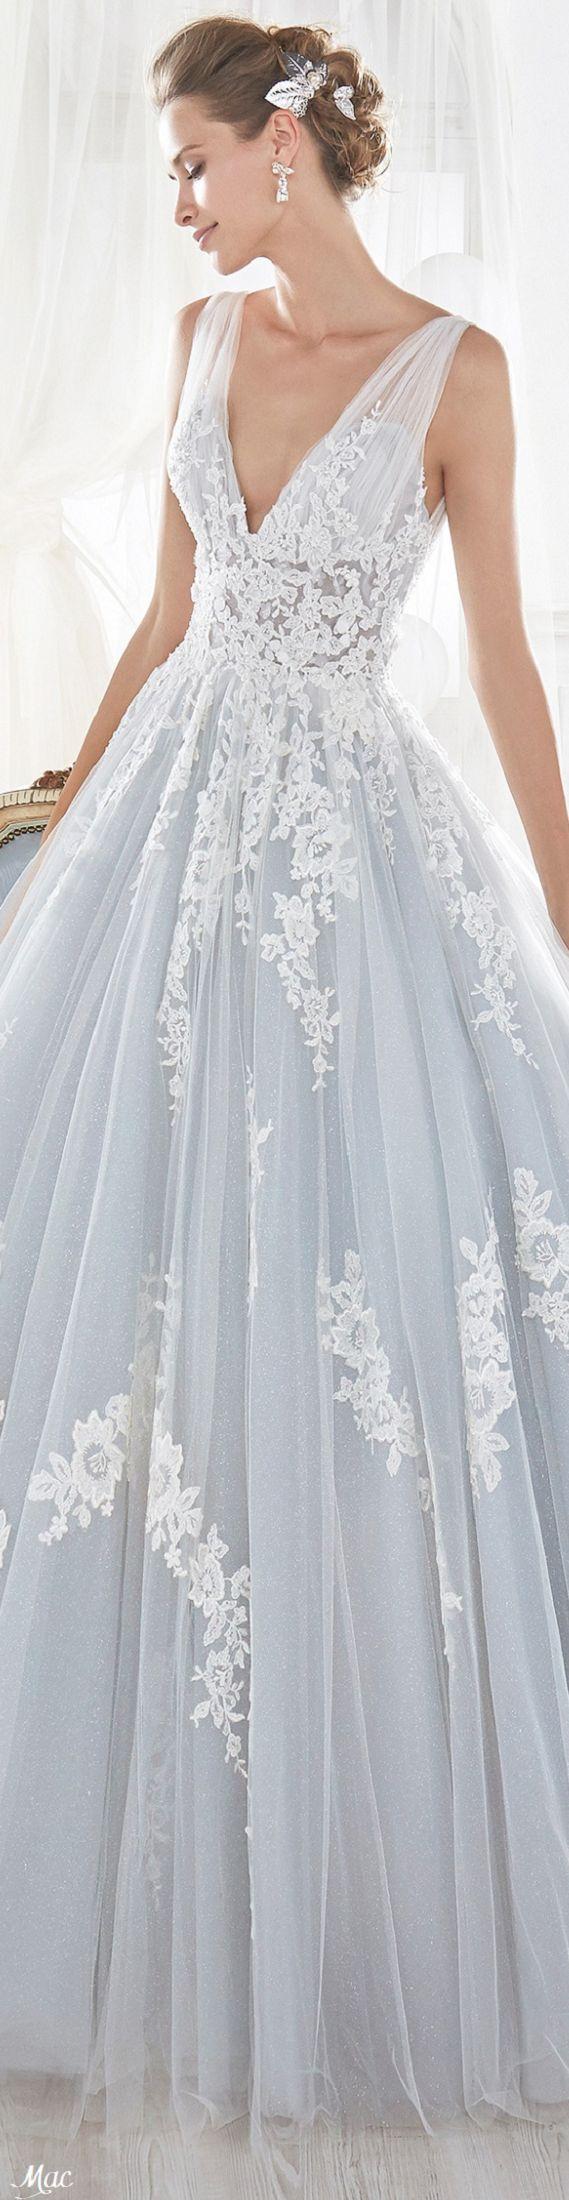 40 best Nicole Spose Wedding Dresses images on Pinterest   Short ...